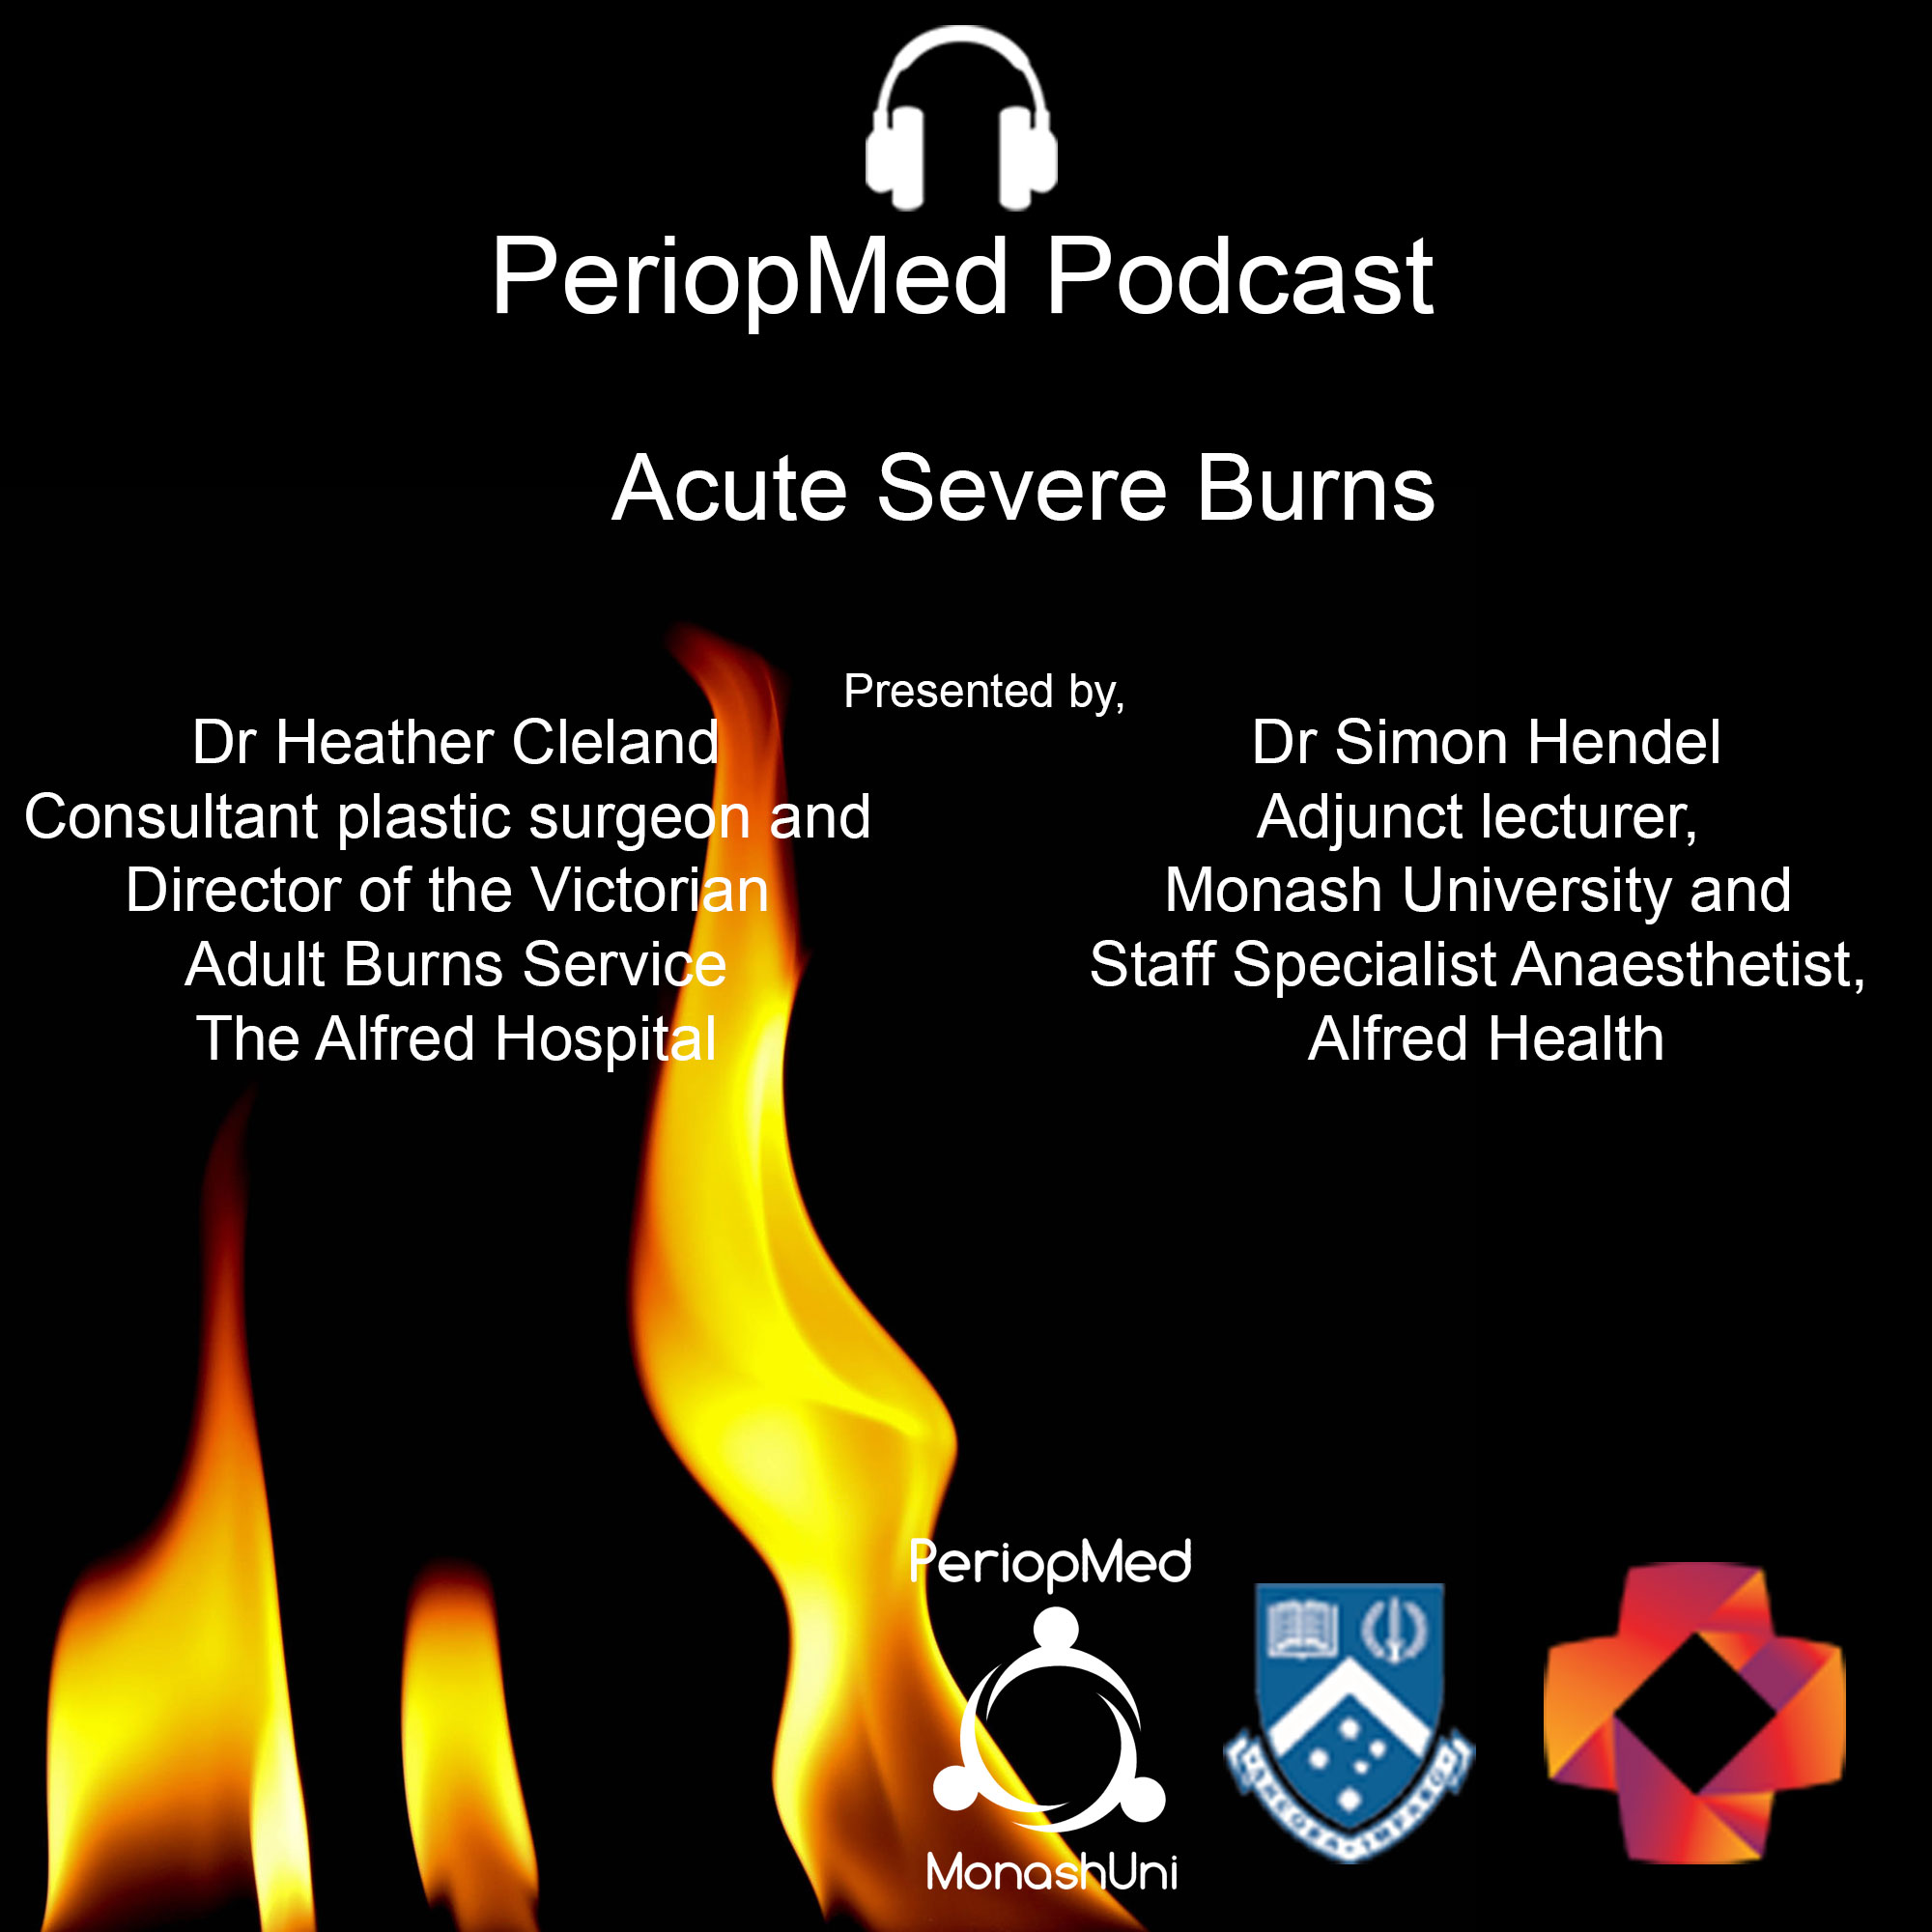 Acute Severe Burns